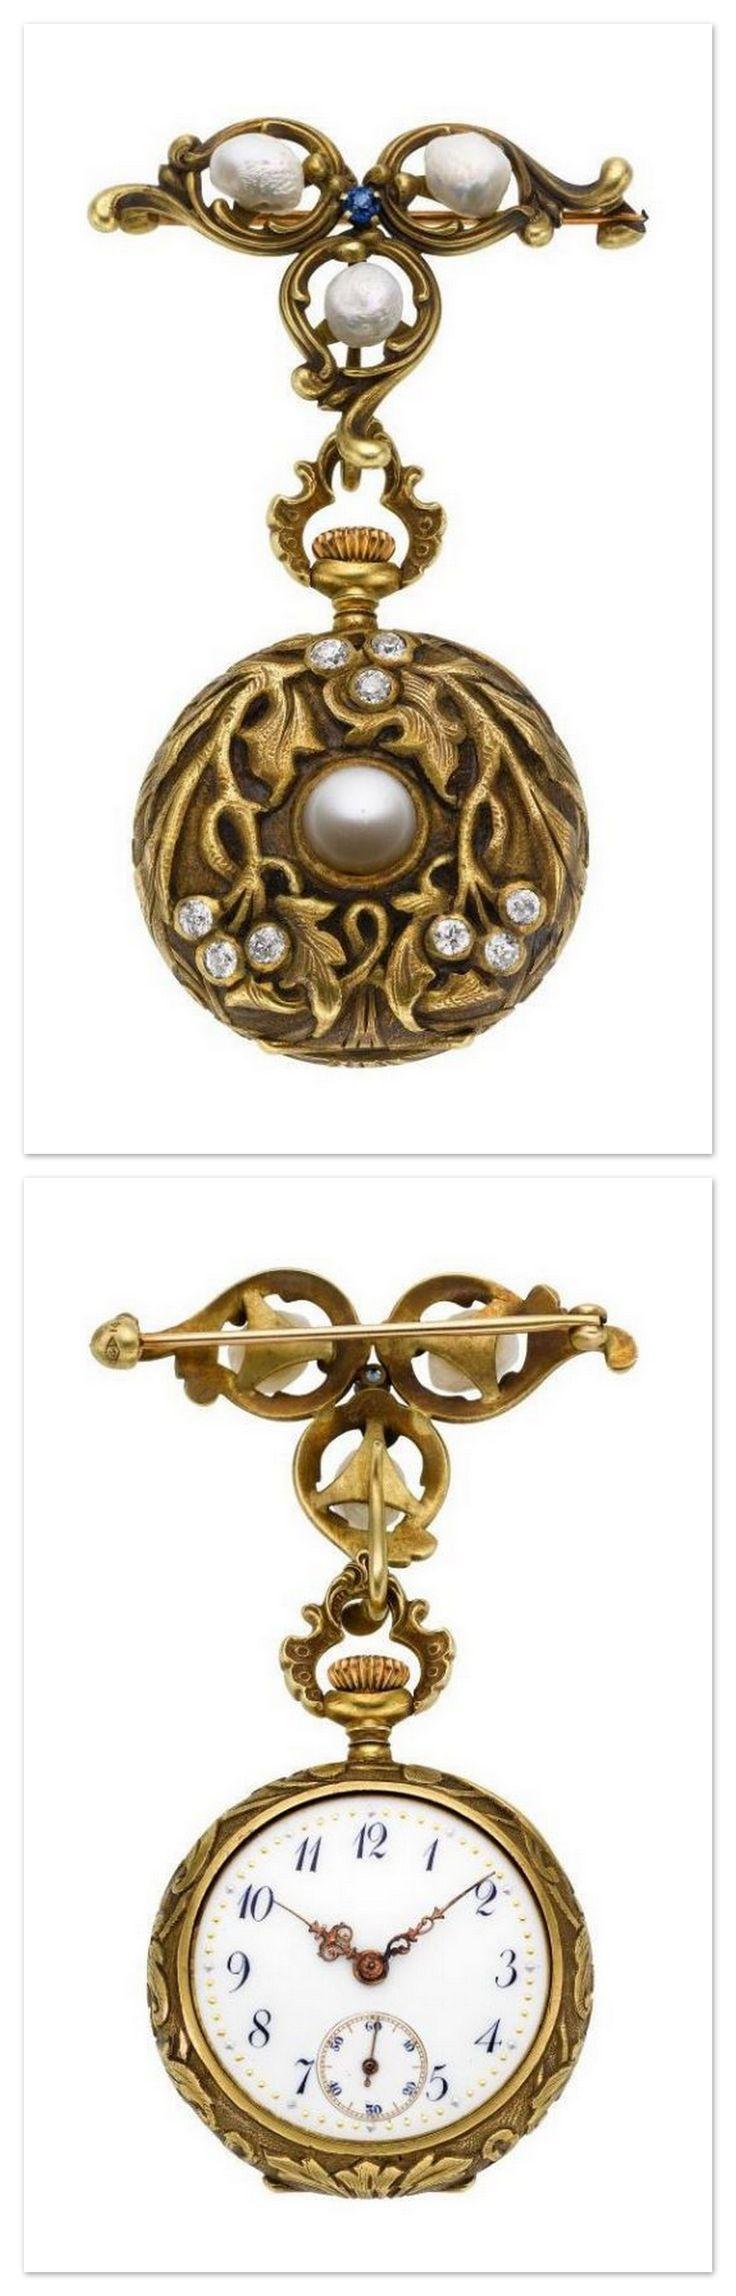 Swiss Art Nouveau Gold, Diamond & Pearl Pendant Watch Lady's Pearl & Enamel Pendant Watch With Chain, circa 1905. | jewelry.ha.com